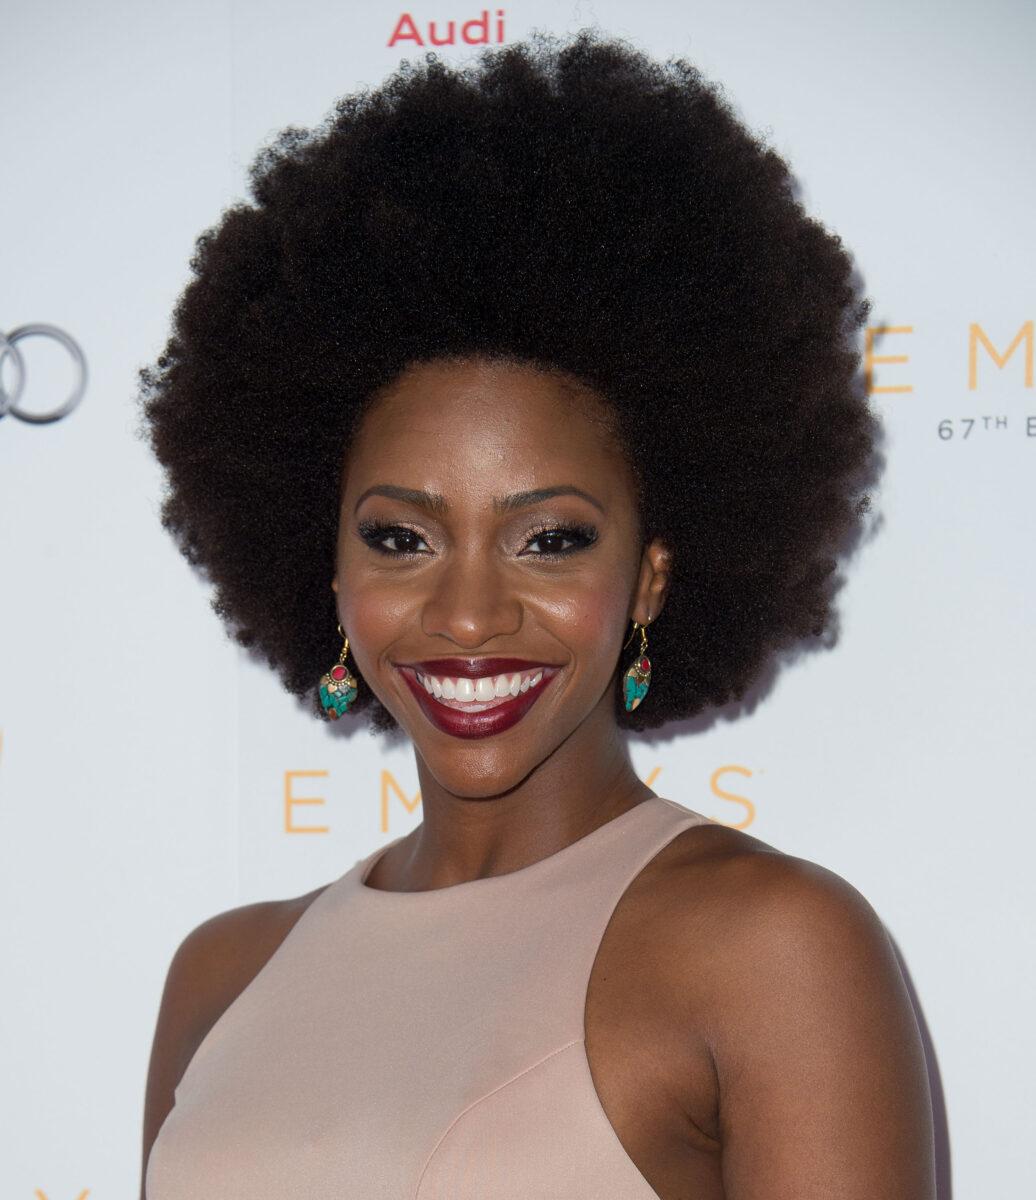 Why are black women afraid of shaving damaged hair?